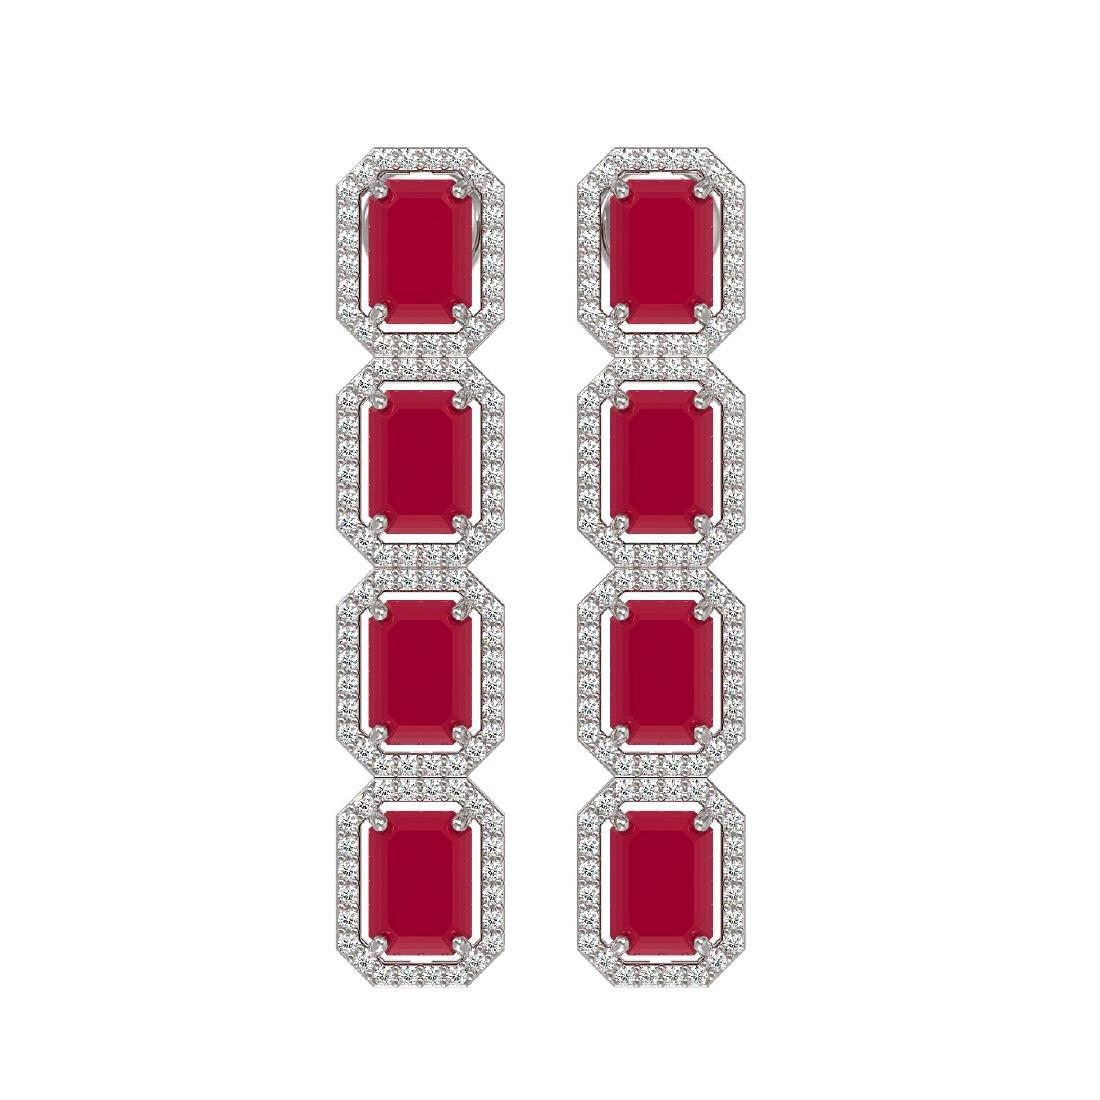 12.33 CTW Ruby & Diamond Halo Earrings 10K White Gold